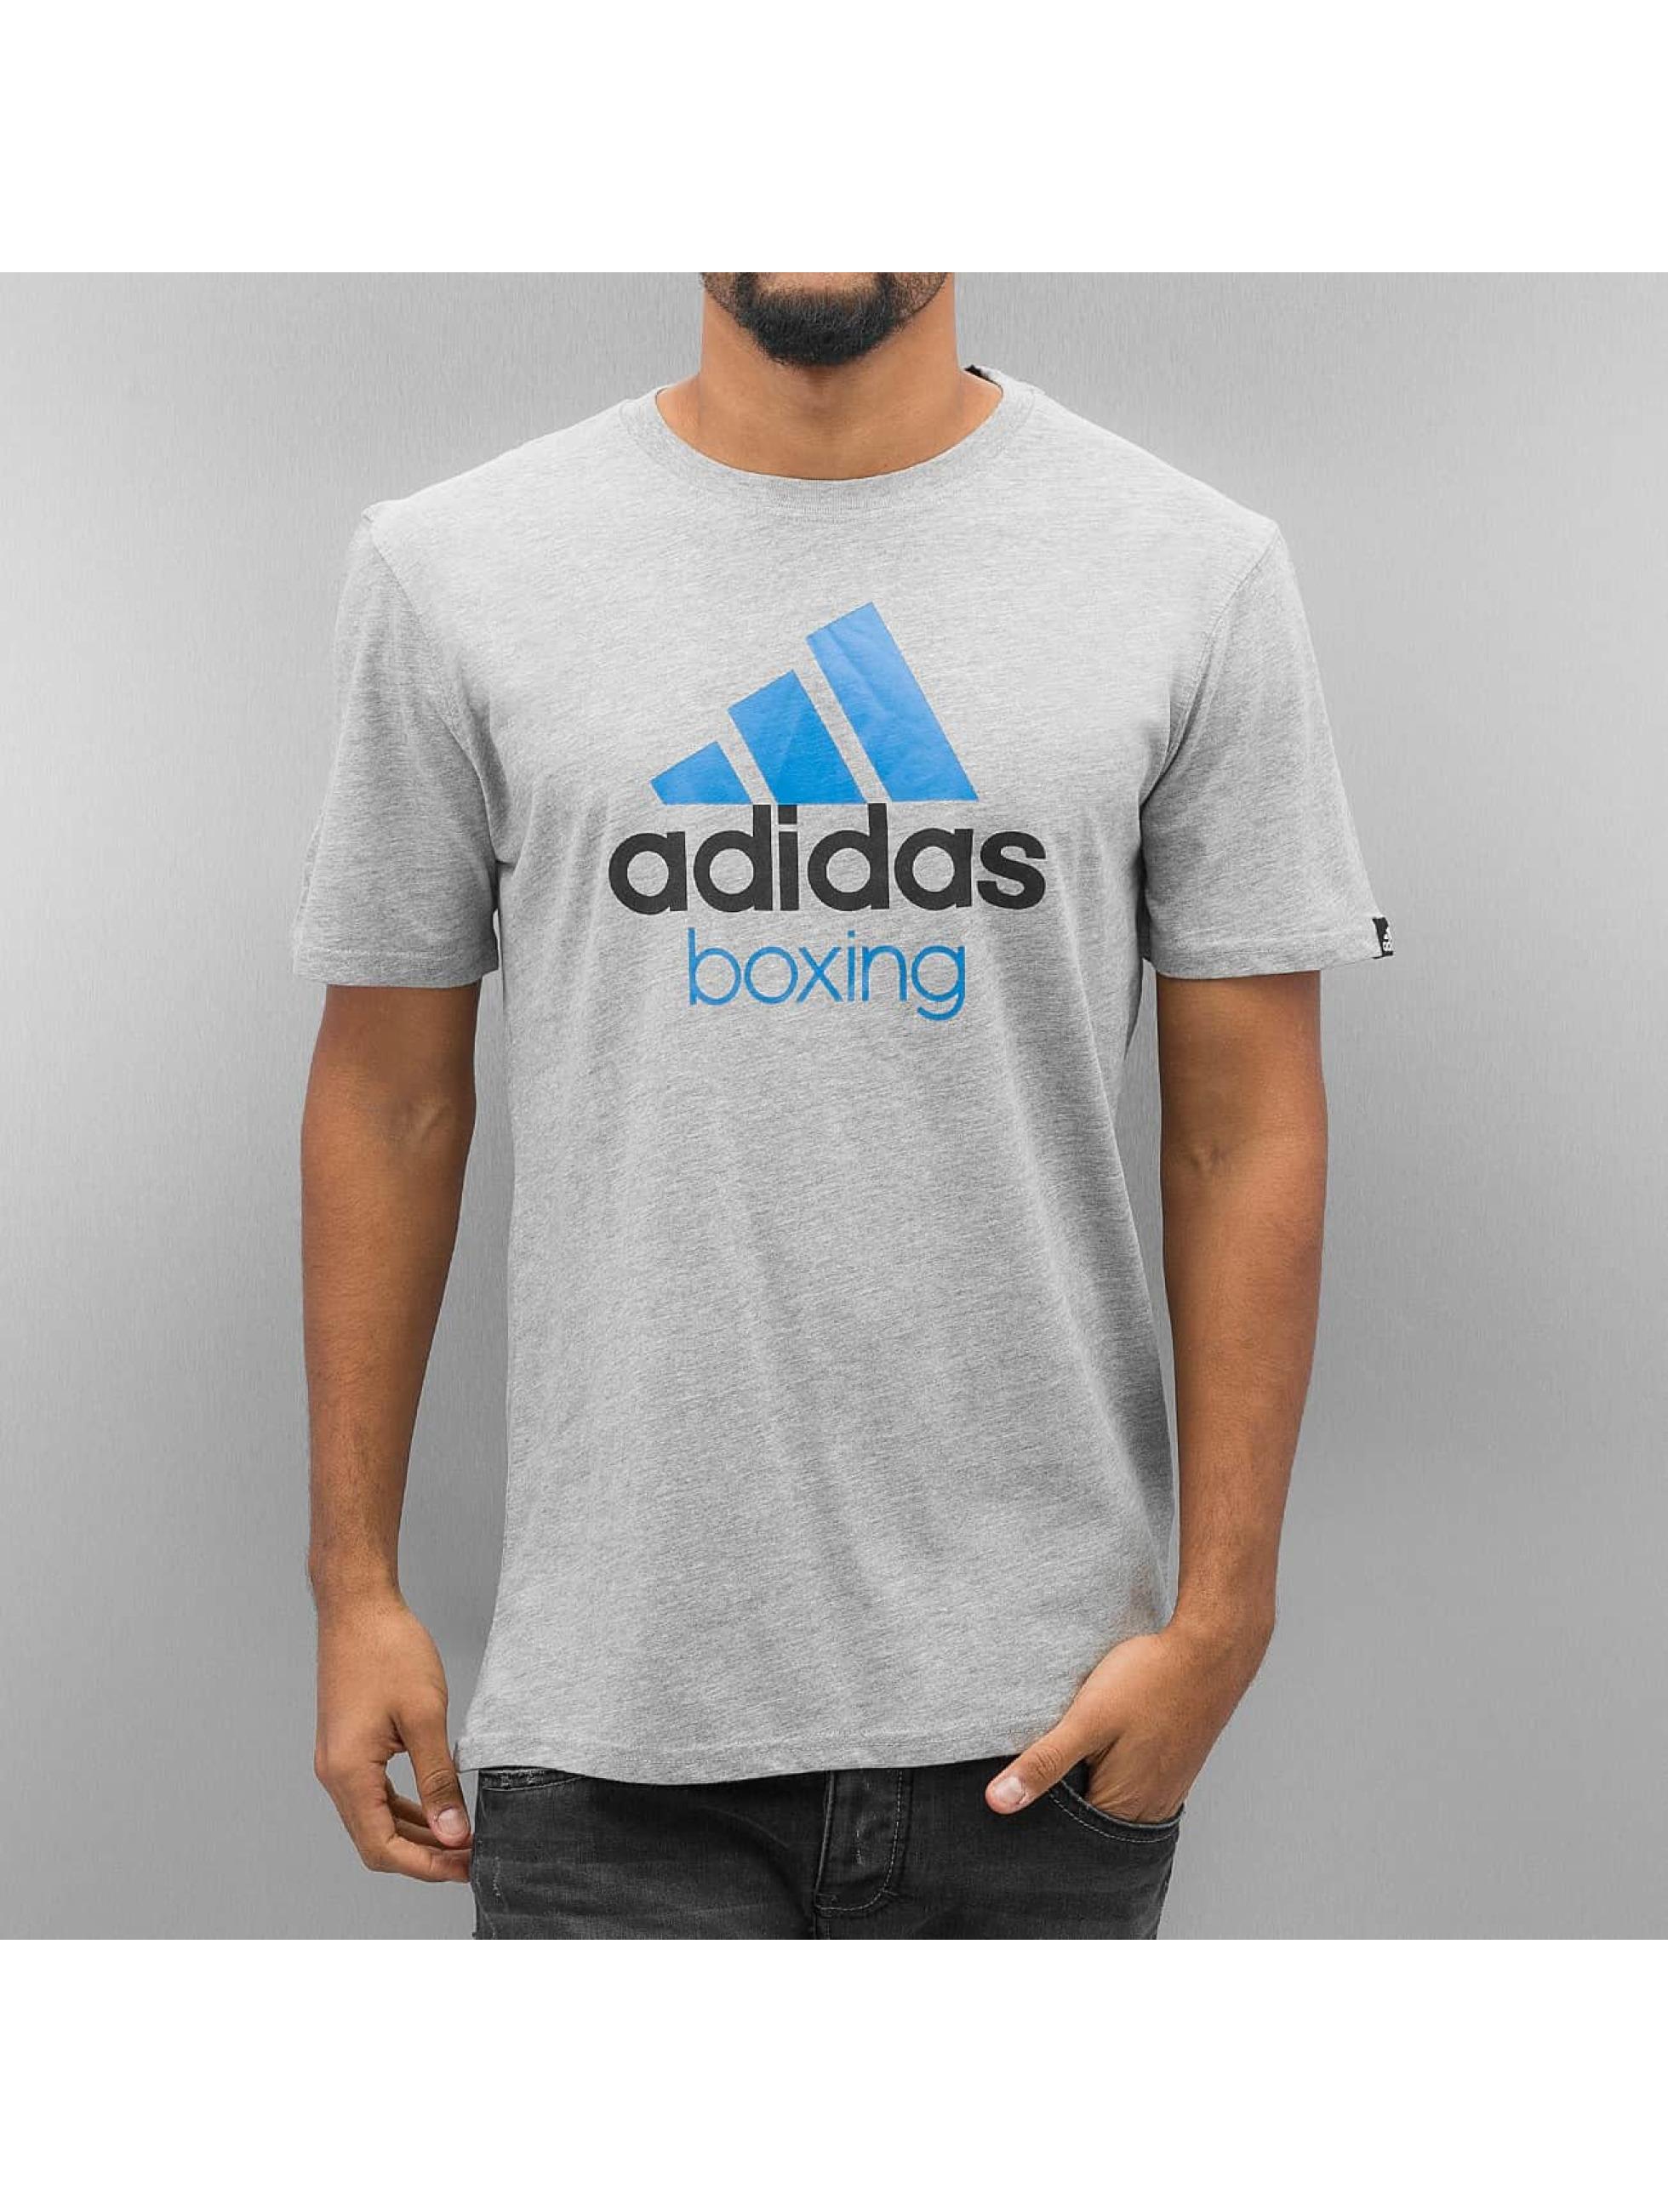 Adidas Boxing MMA / T-Shirt Community in gray